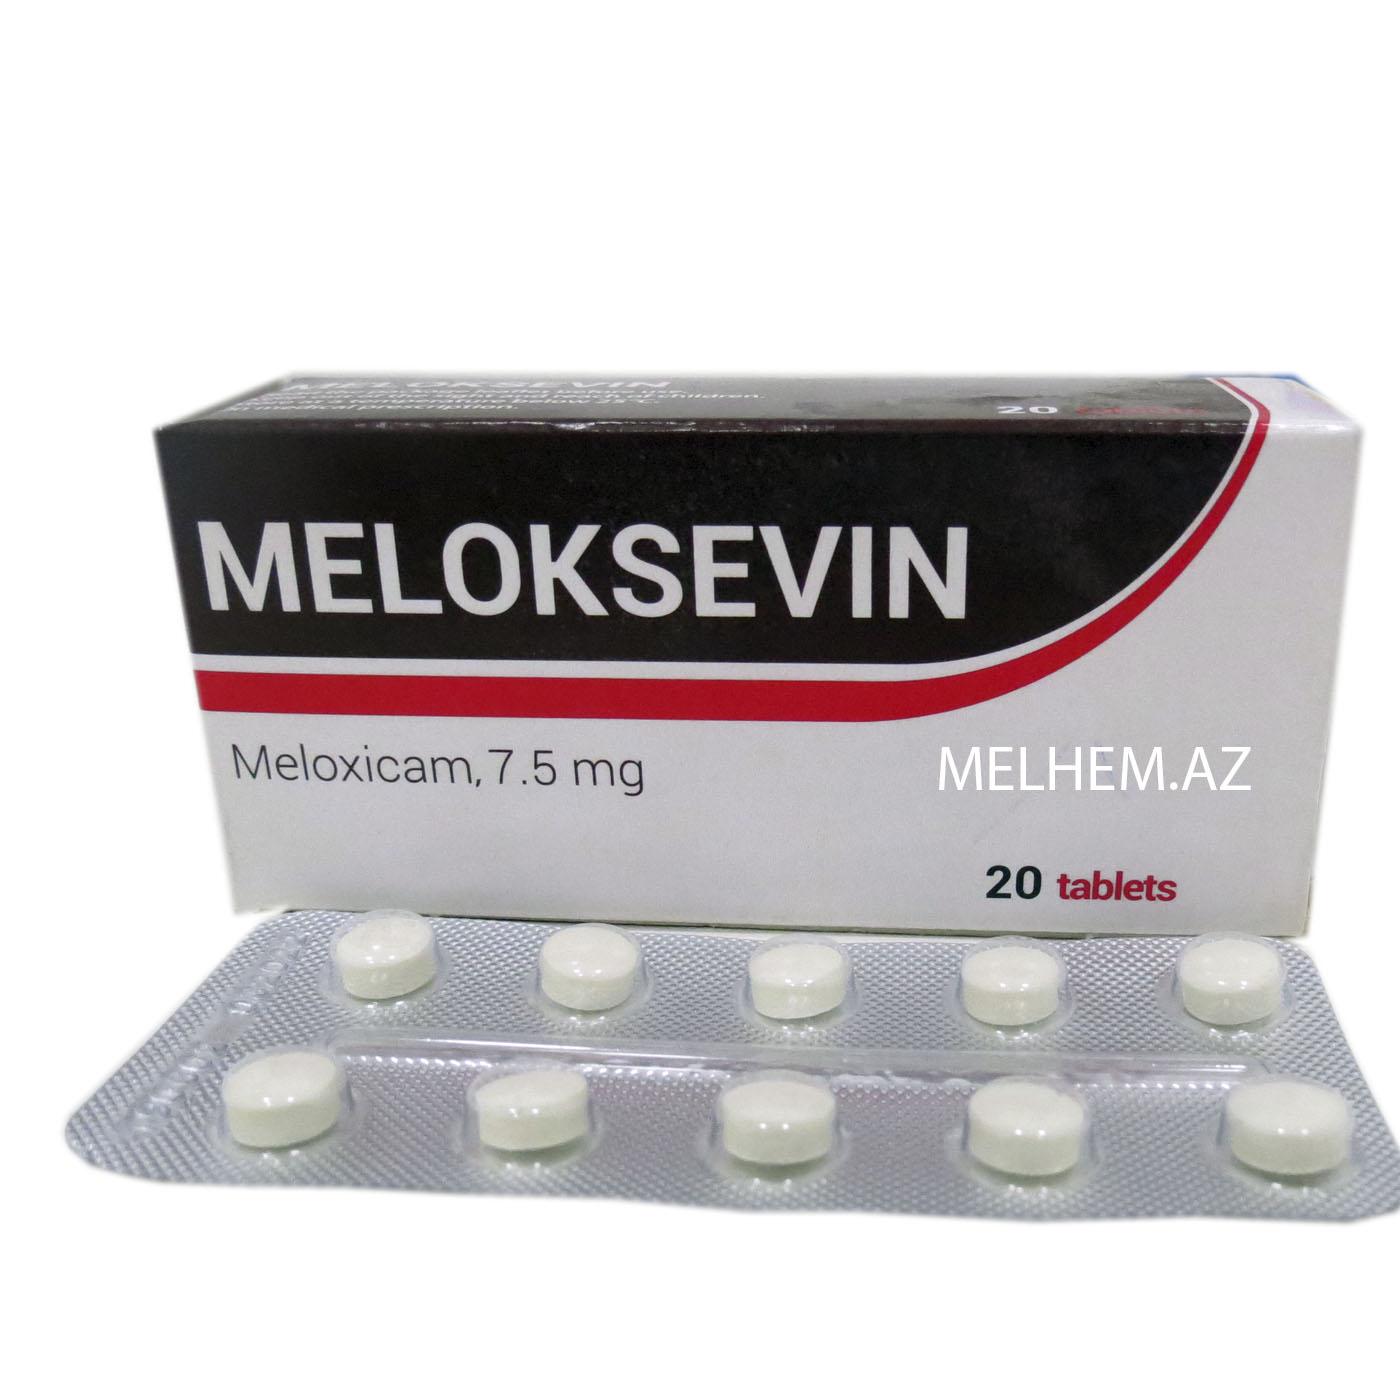 MELOKSEVIN